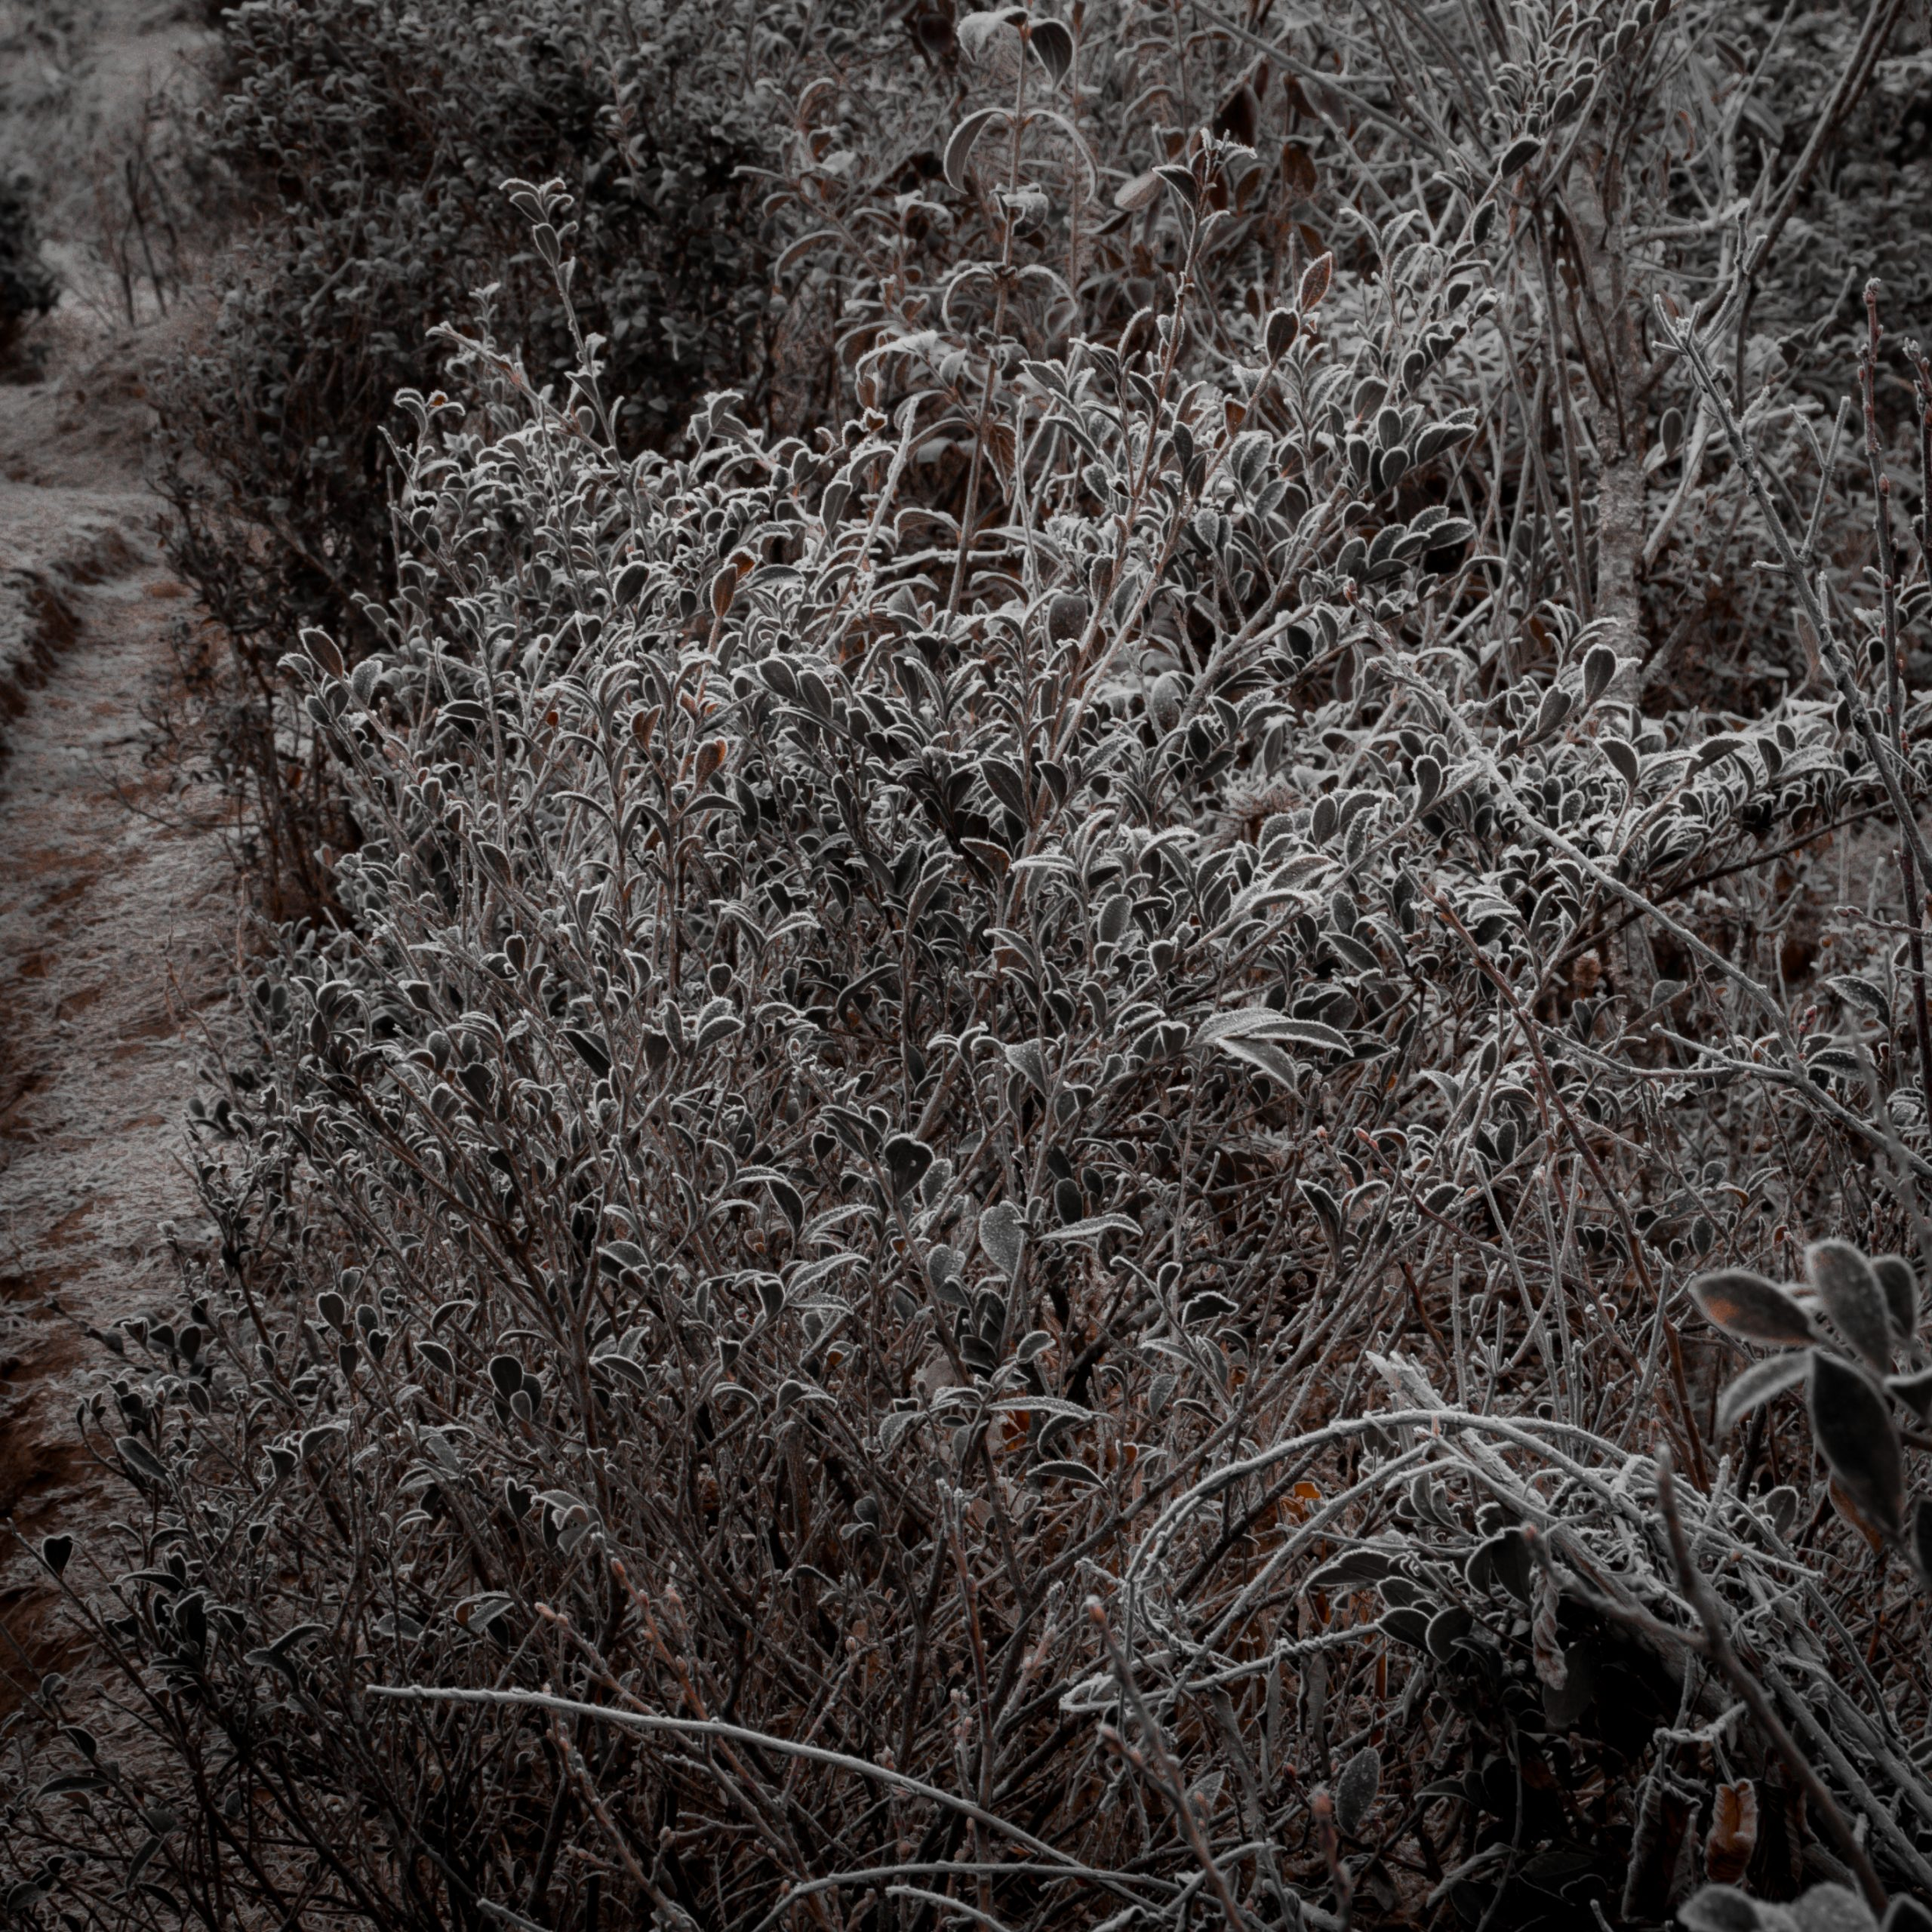 Frozen black and white bushes